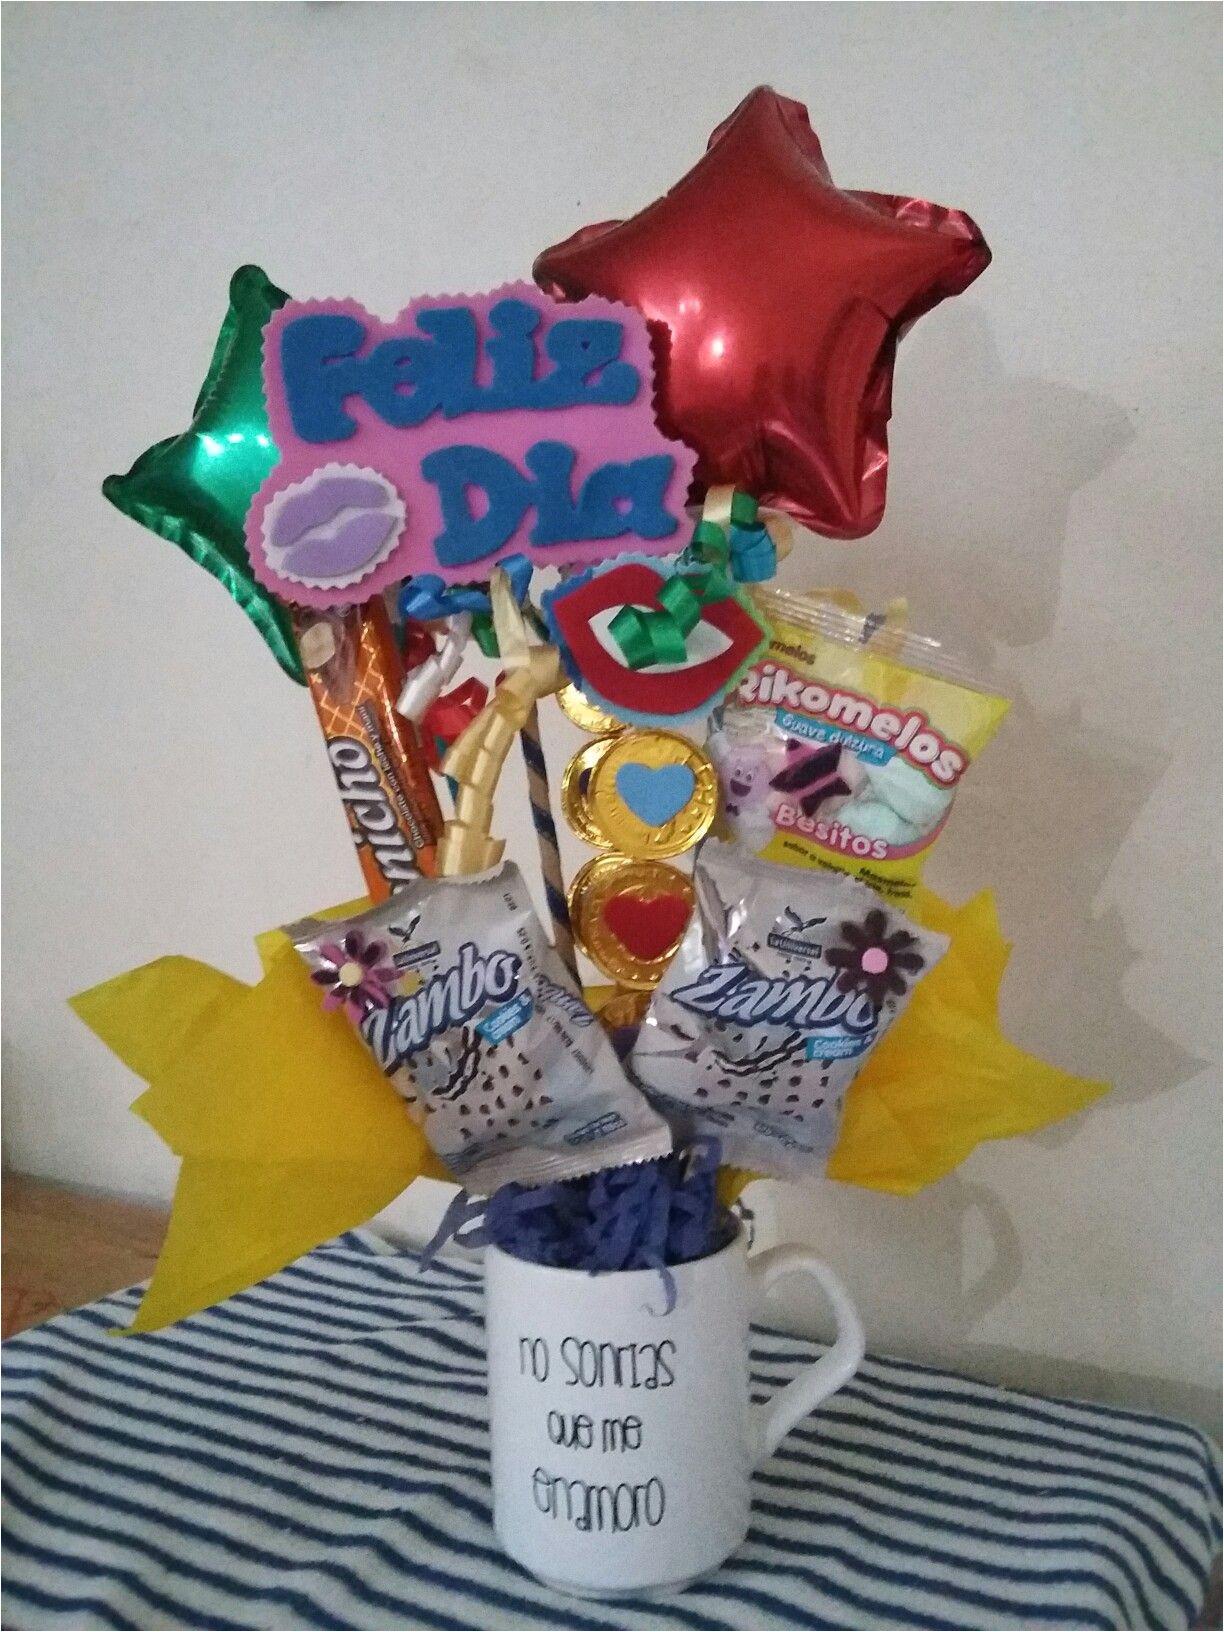 arreglos con dulces para aniversario o san valentin